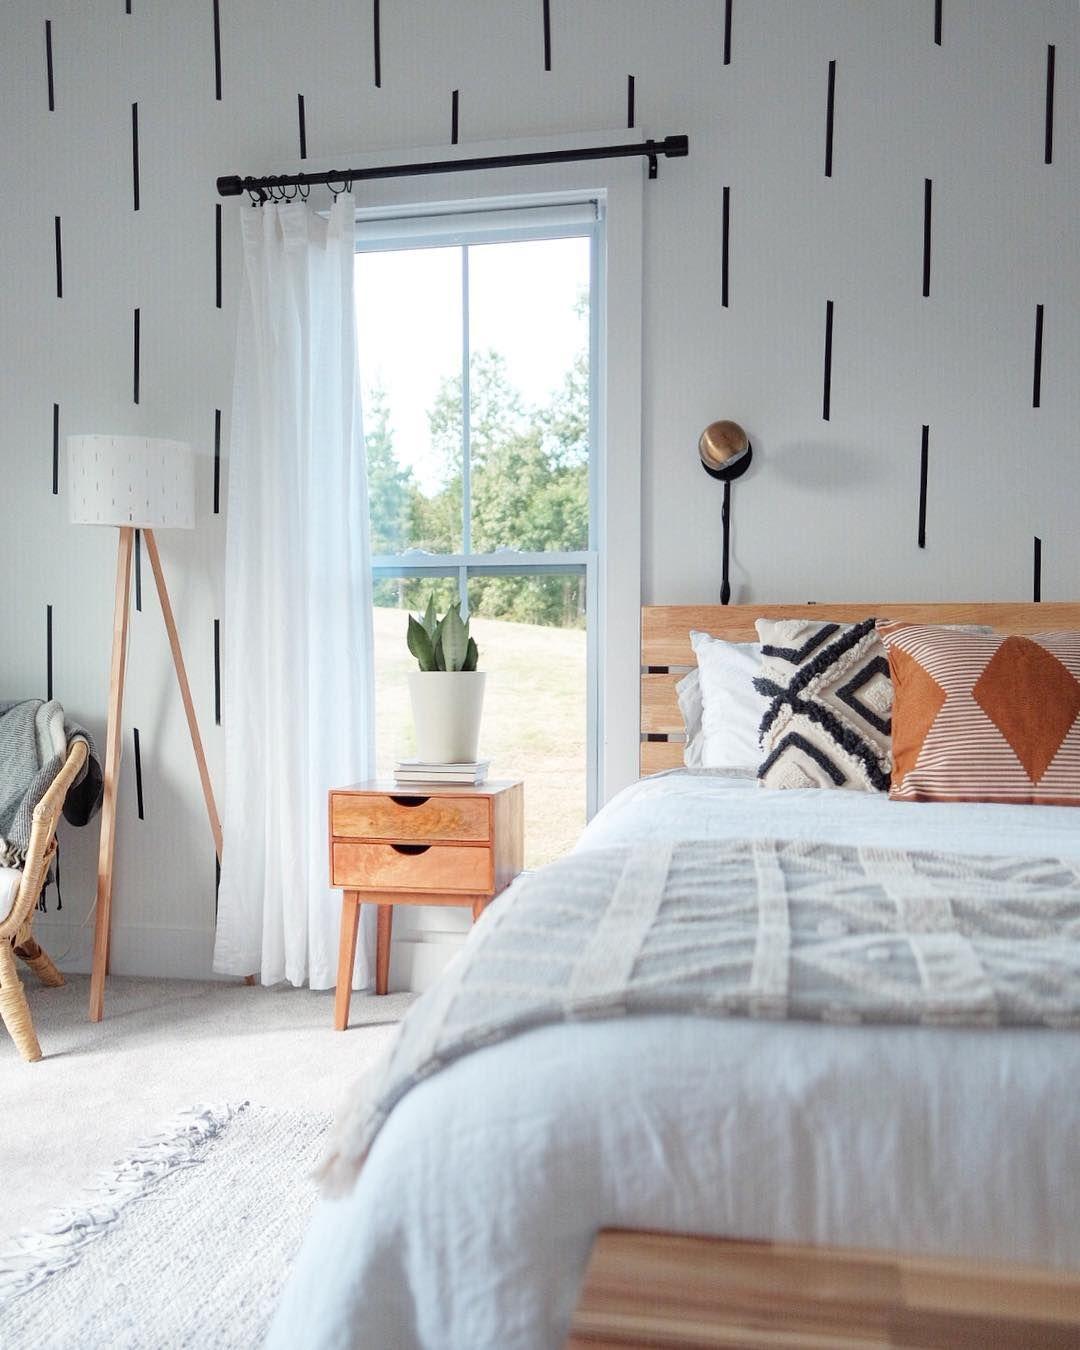 Zinus Sonoma Platform Bed Frame Sionnach Dalur House Home